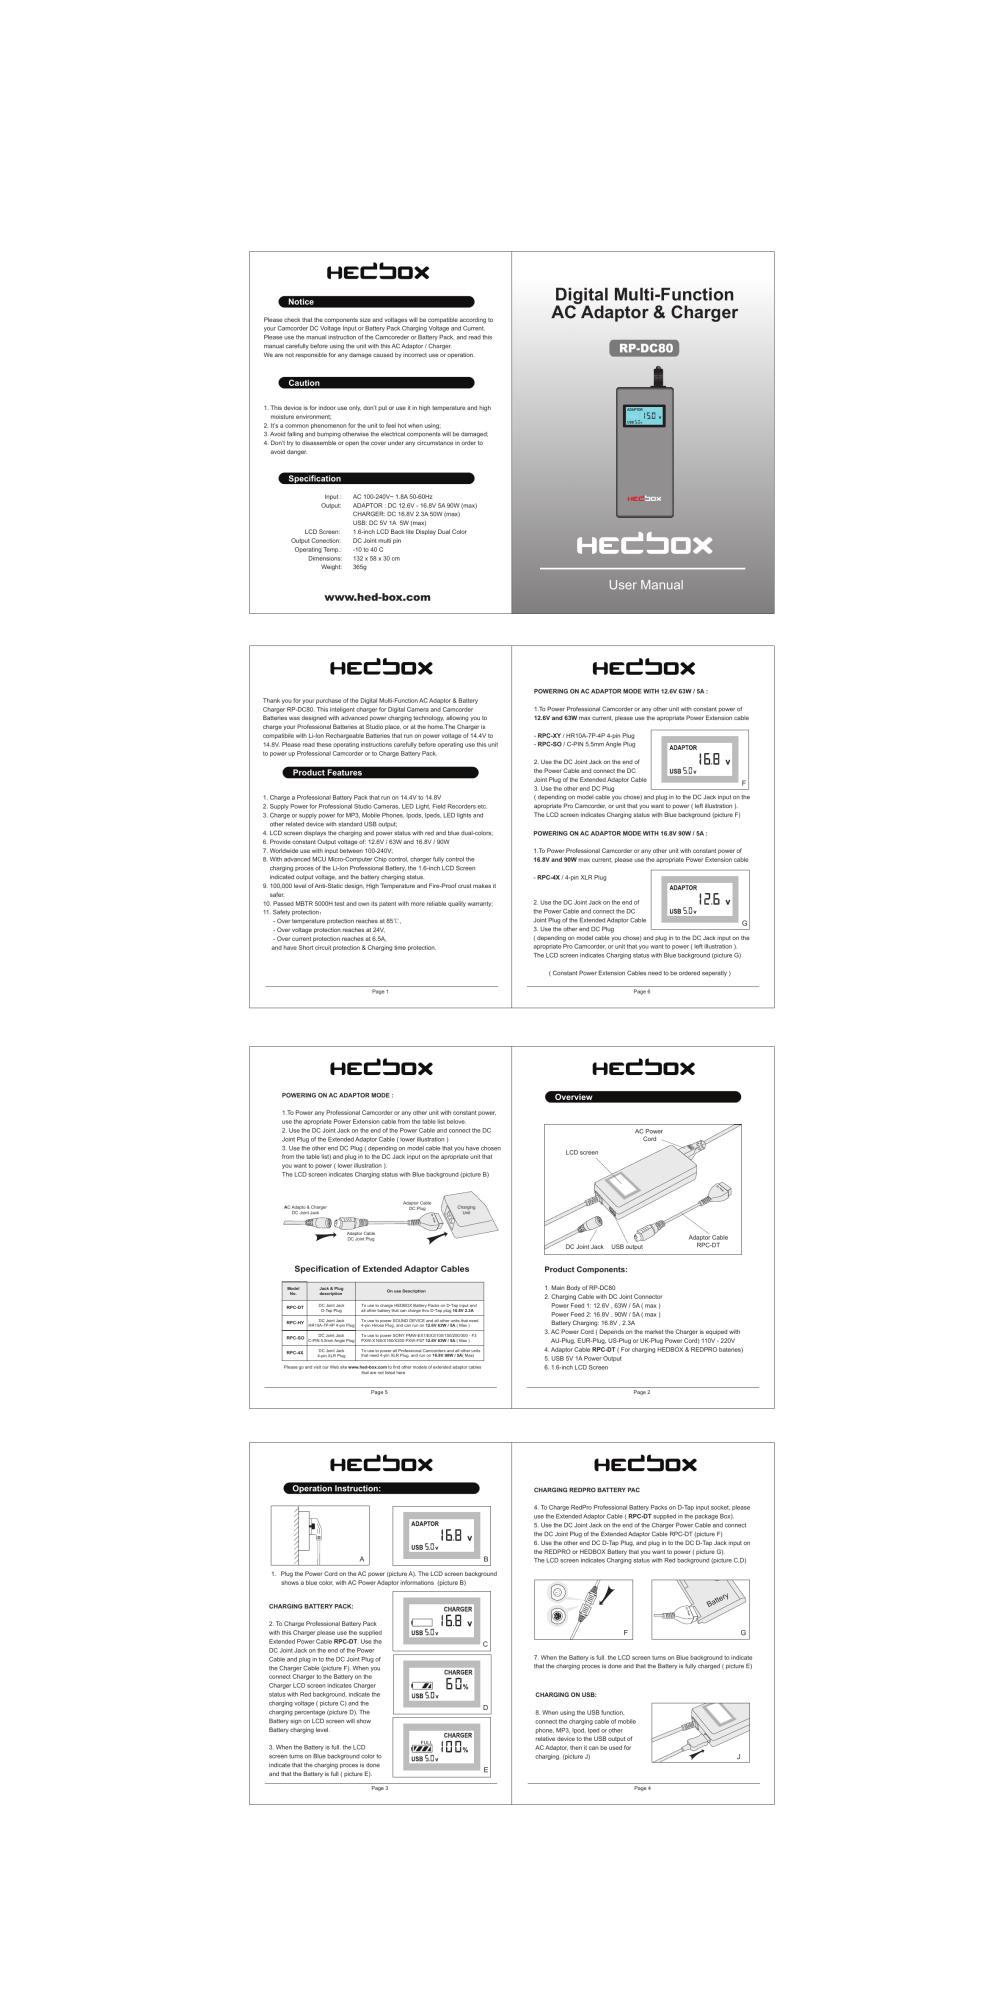 medium resolution of hedbox rp dc80 user manual